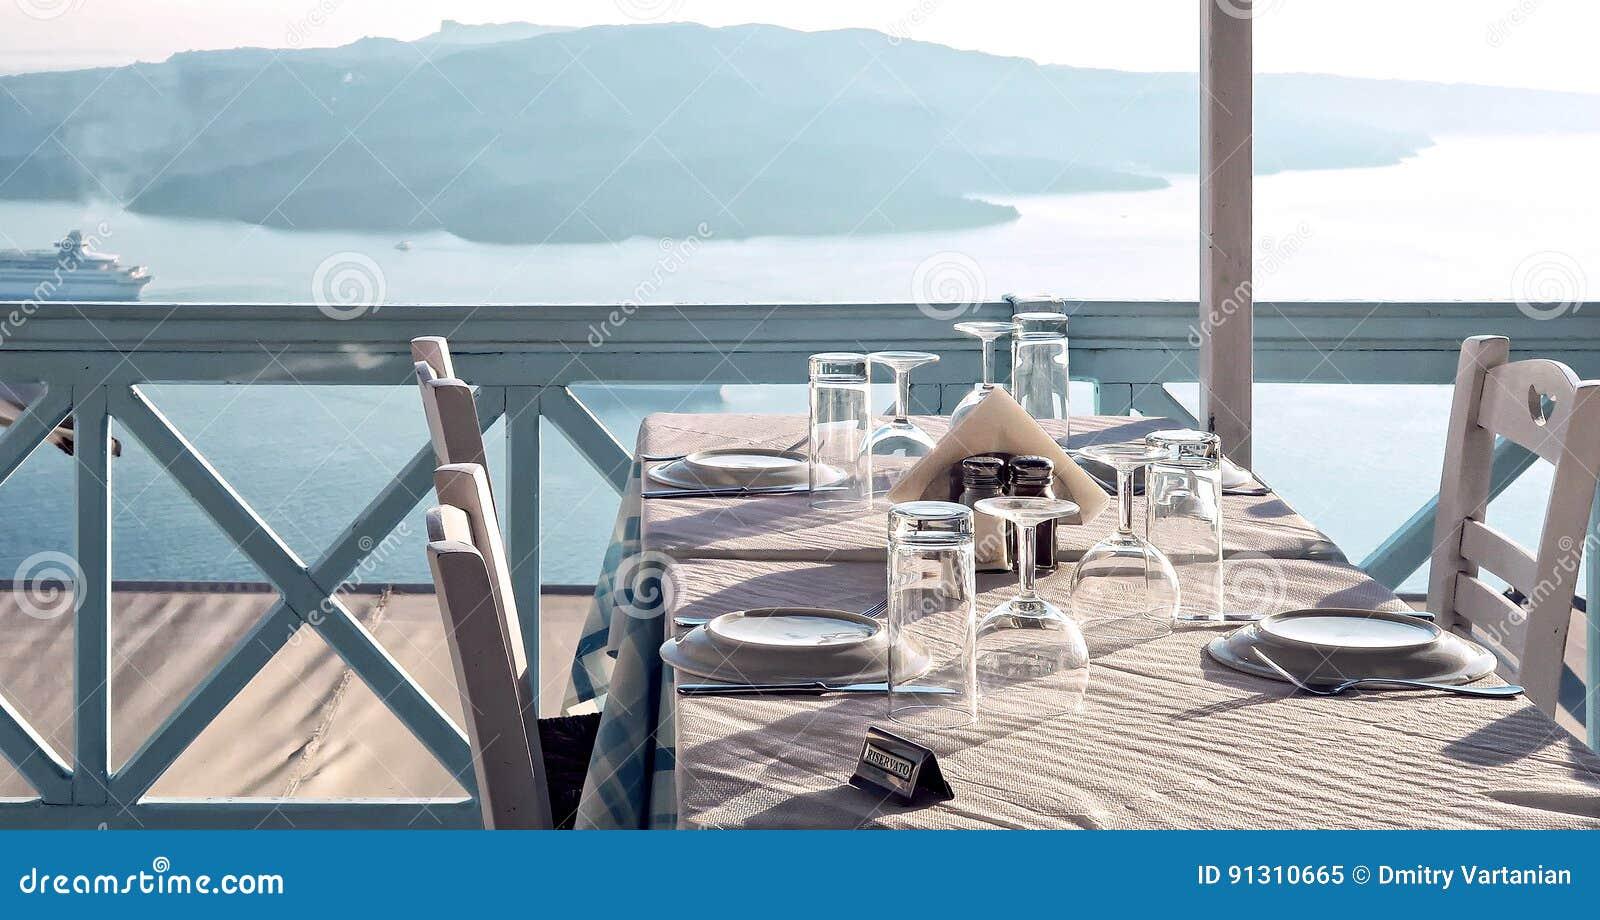 Table on patio, Thira, Santorini Island, Greece